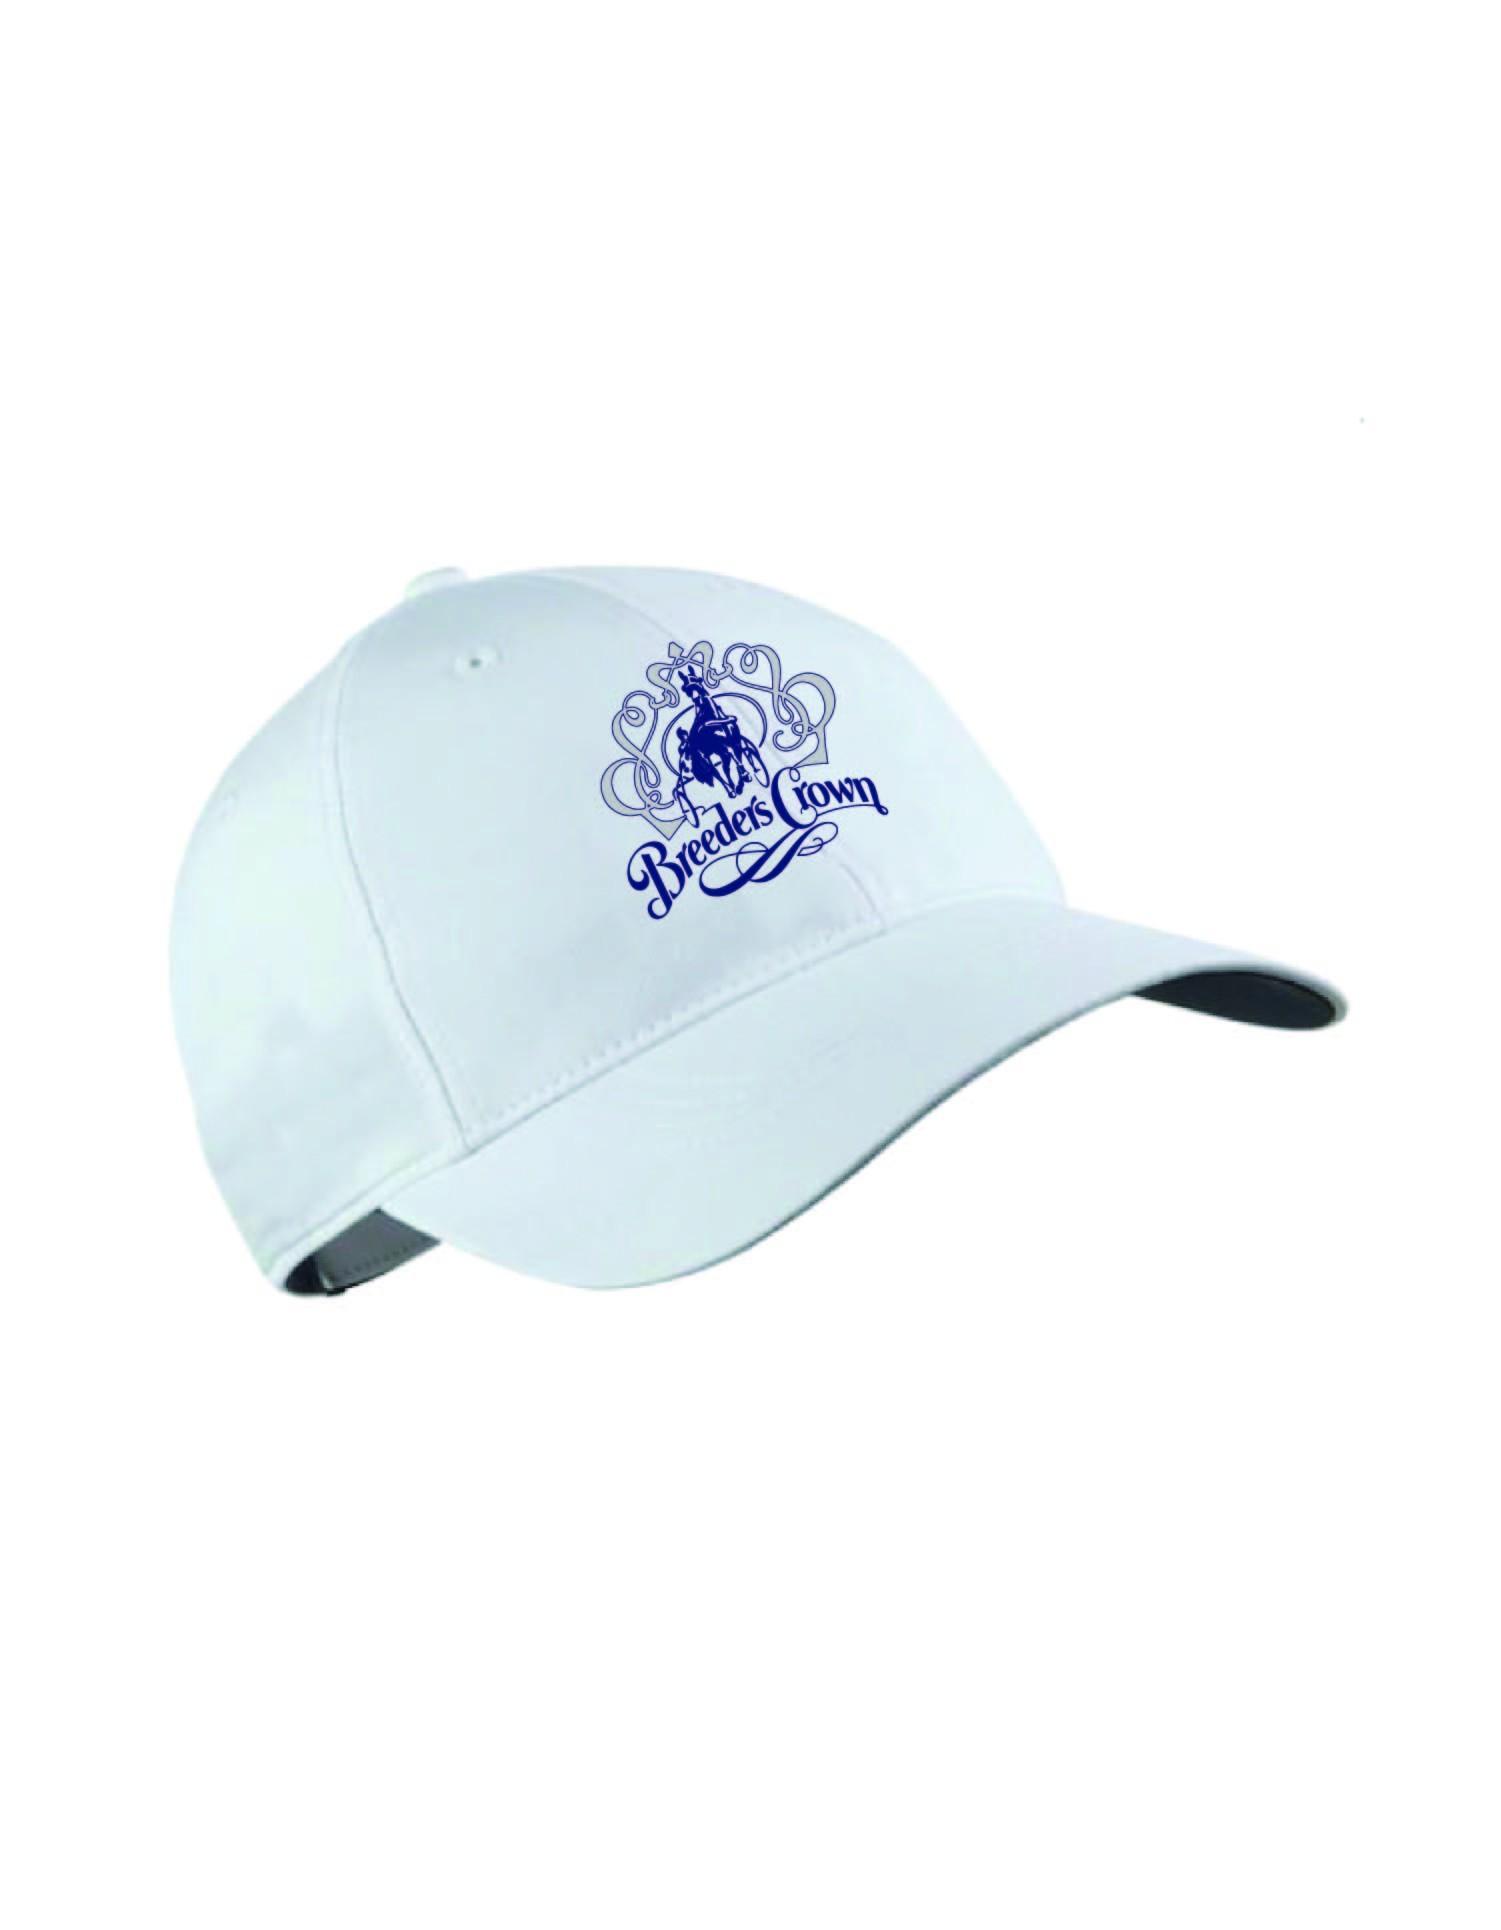 304a353d34b89 ... white baseball cap 238b7 ba91e  promo code for breeders crown nike hat  hats breeders crown hambletonian fe585 db2b8